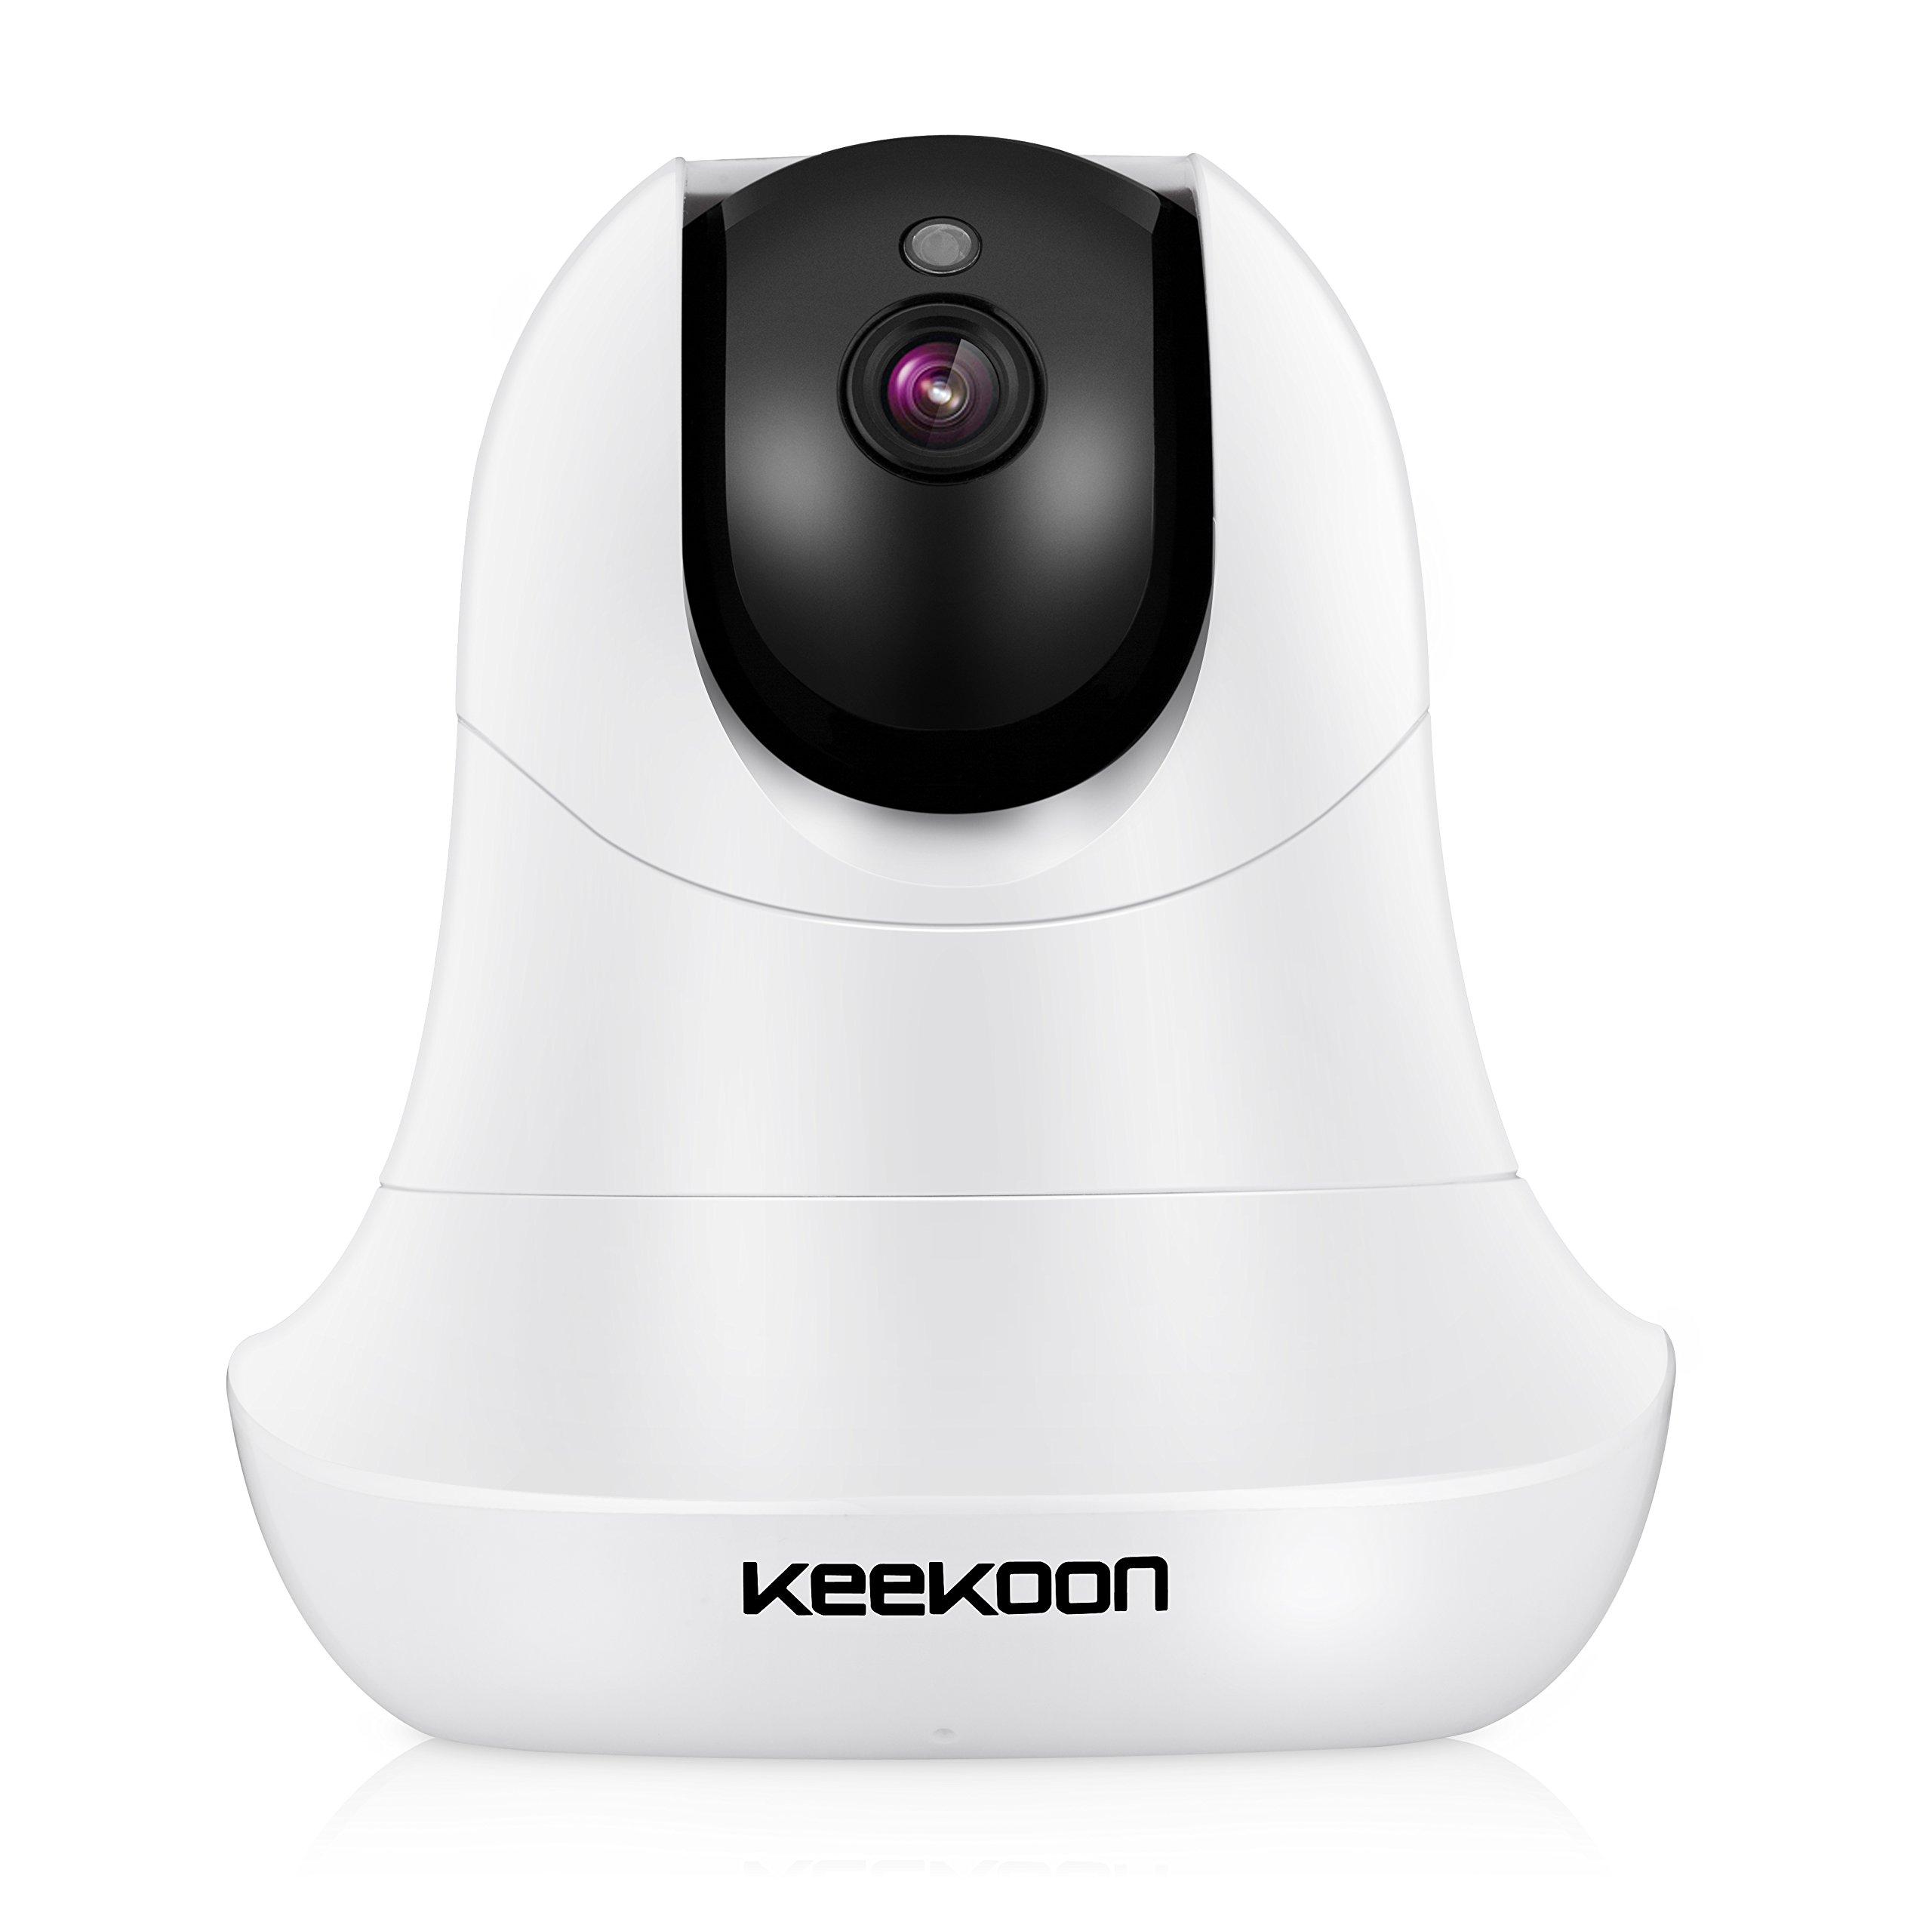 KEEKOON HD 1080P IP Camera Wireless WiFi Baby Pet Monitor Plug/Play Pan/Tilt 2-Way Audio Night Vision Home Security Surveillance Camera (white)